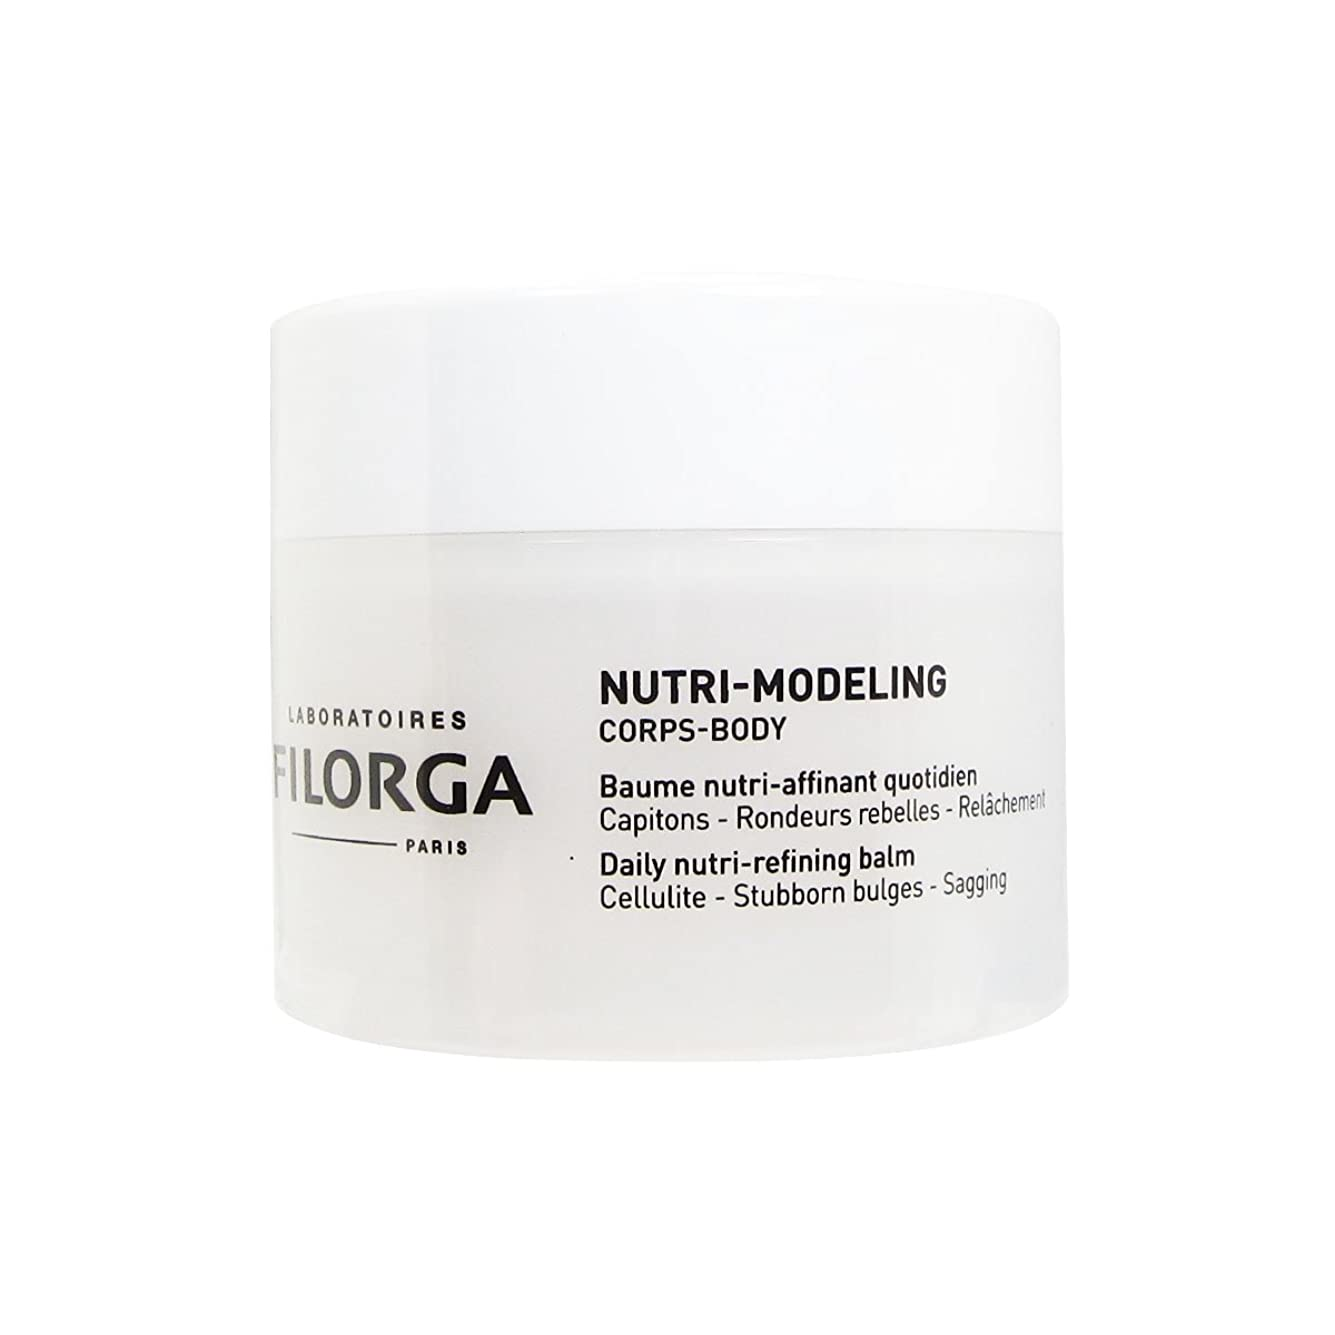 Filorga Nutri Modeling Daily Body Enhancer 200ml [並行輸入品]